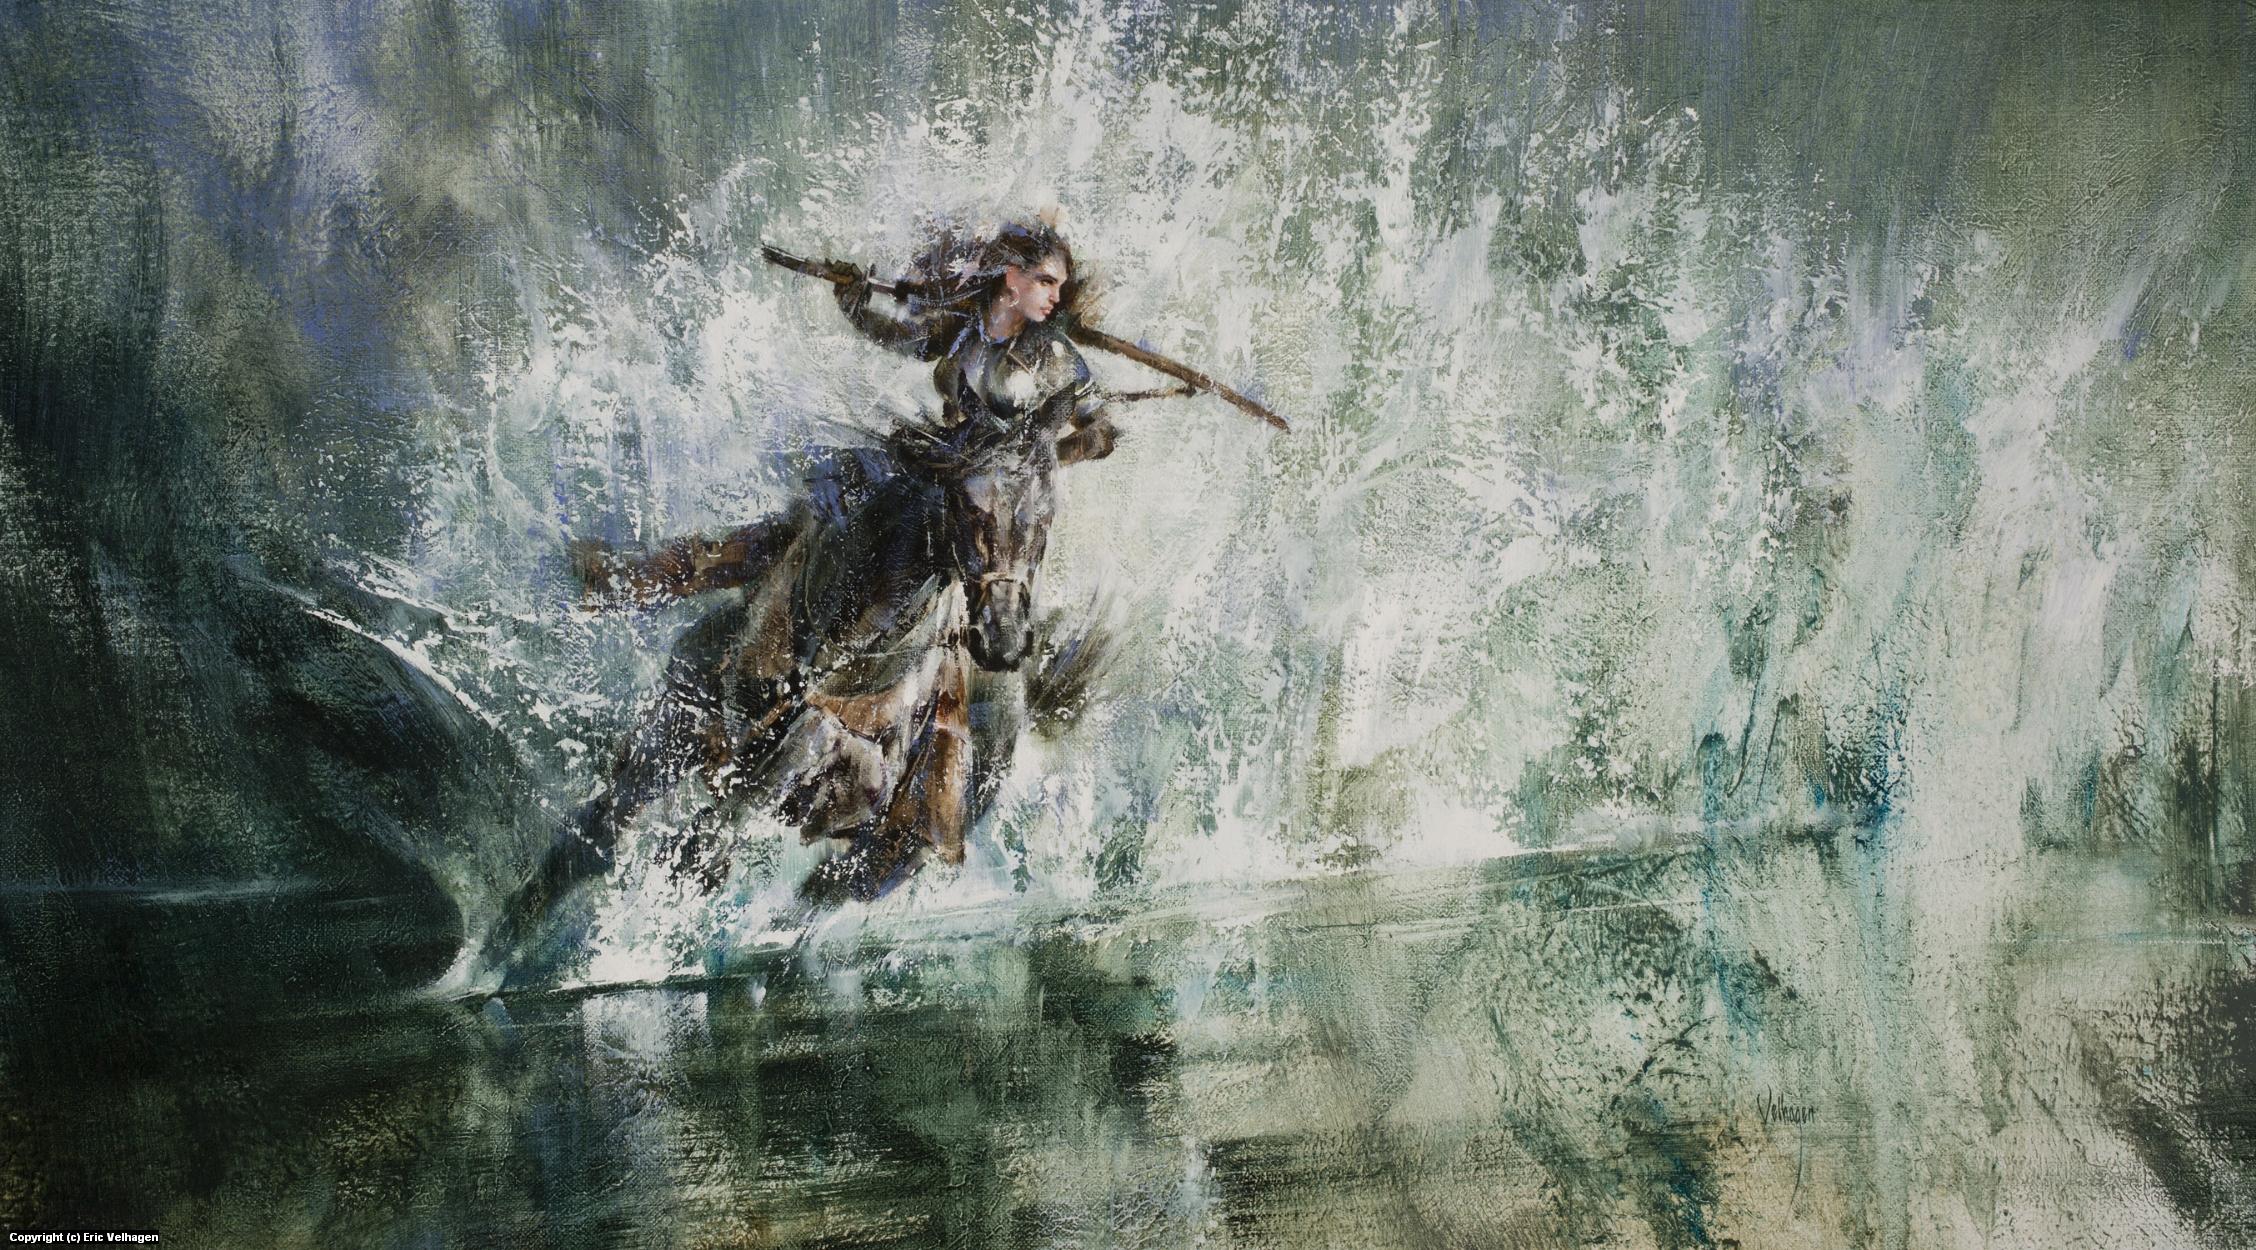 Target Acquired Artwork by Eric Velhagen